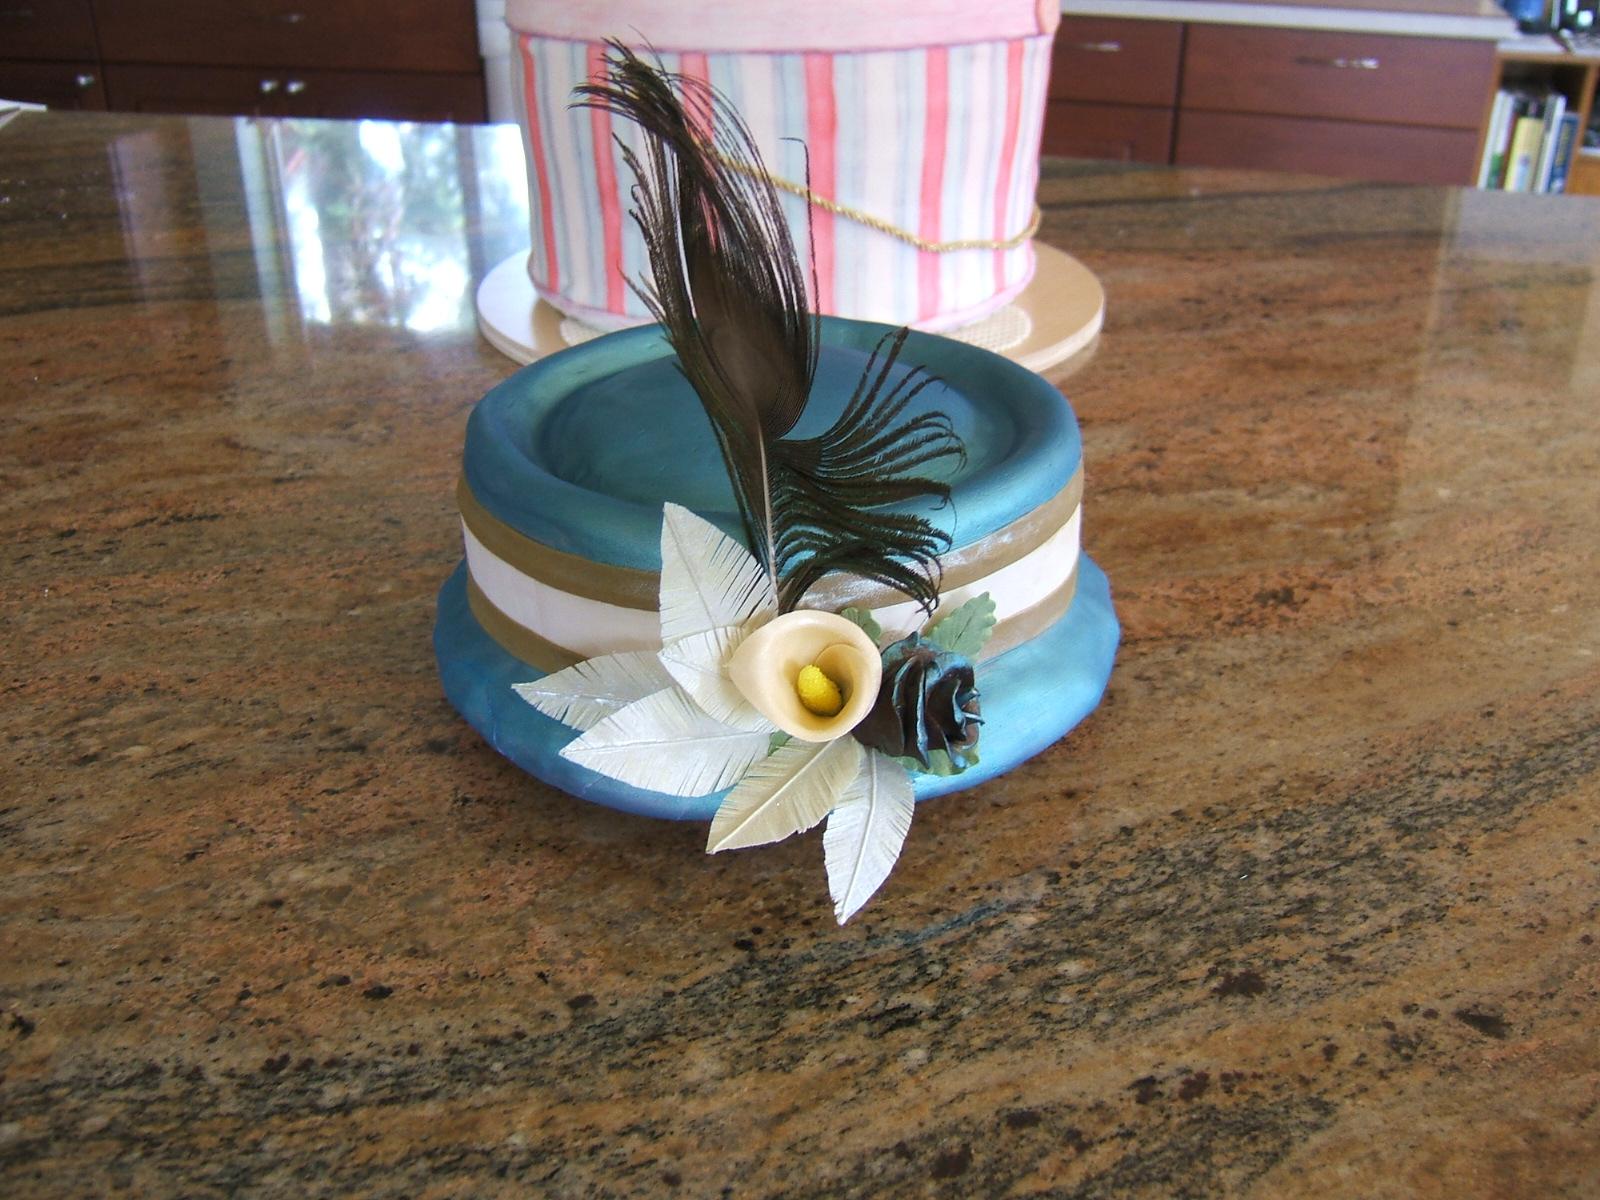 http://2.bp.blogspot.com/_1zkrOdGewIw/S9RrwKM_-hI/AAAAAAAAAd0/BkK4U7uMYJ0/s1600/Hat+and+Hat+Box+Cake+014.jpg